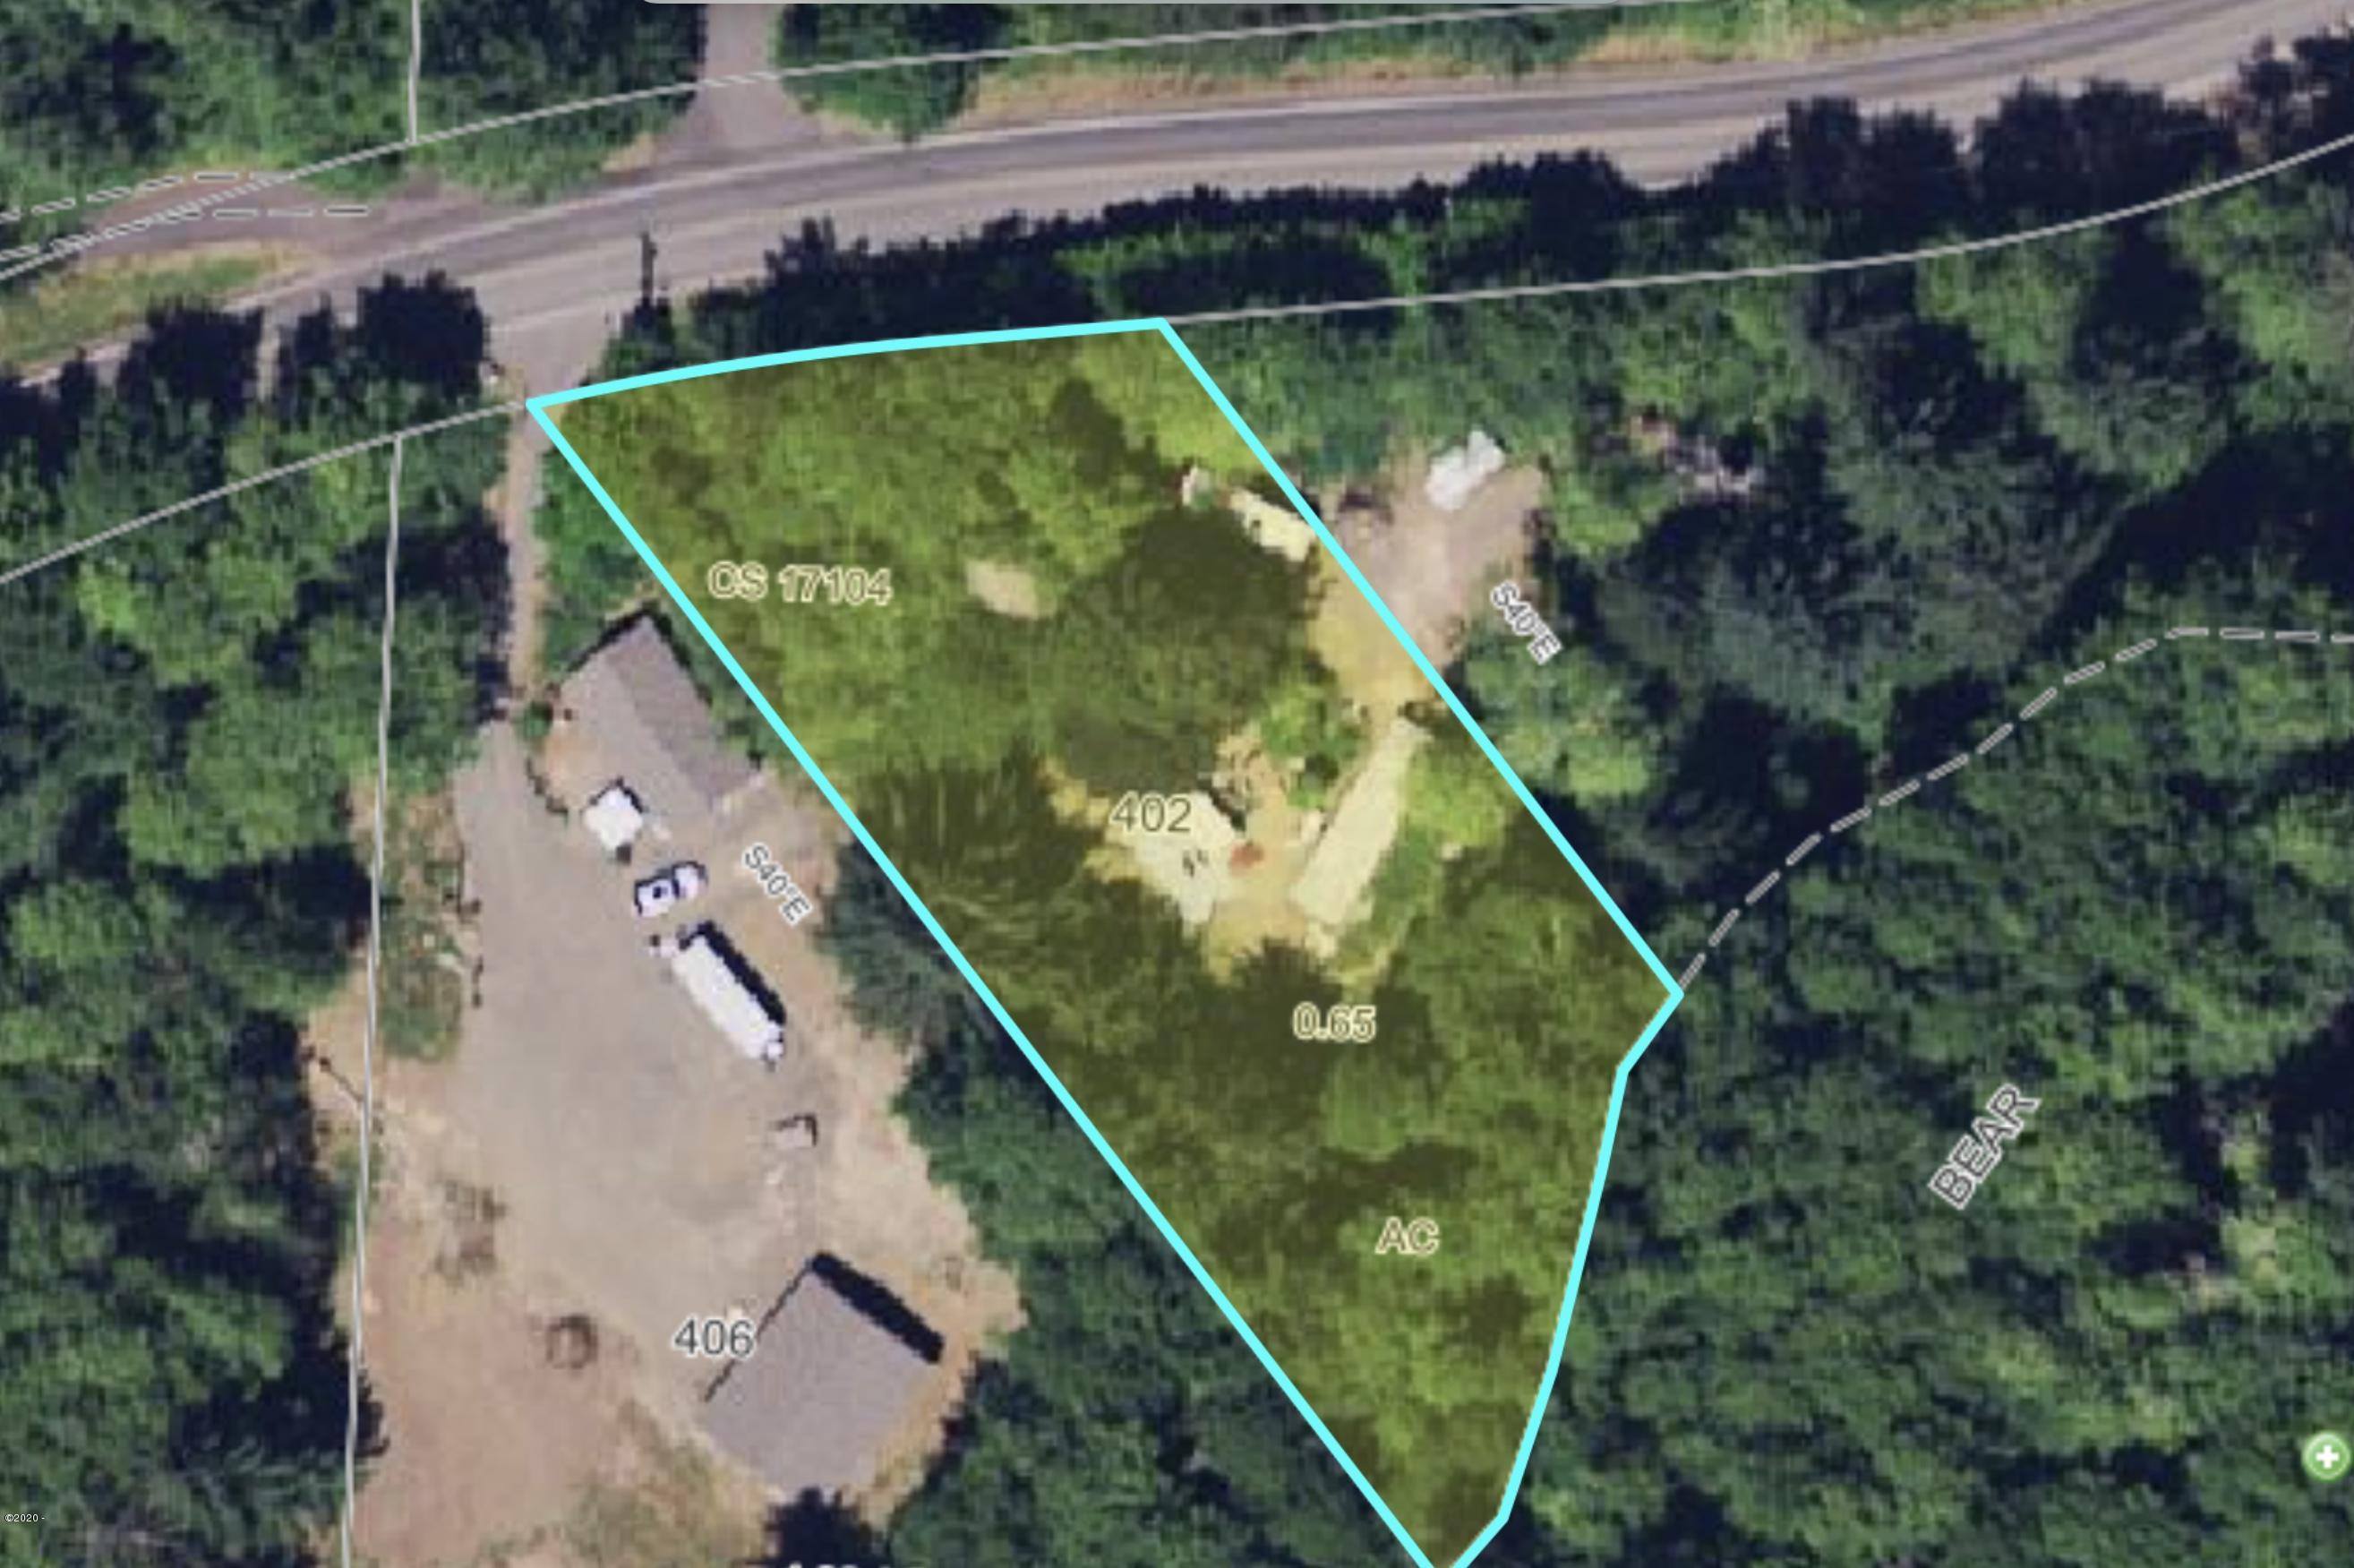 1363 N Bear Creek Rd, Otis, OR 97368 - A08D6DA7-0CBC-42F7-A11D-20161125A16B